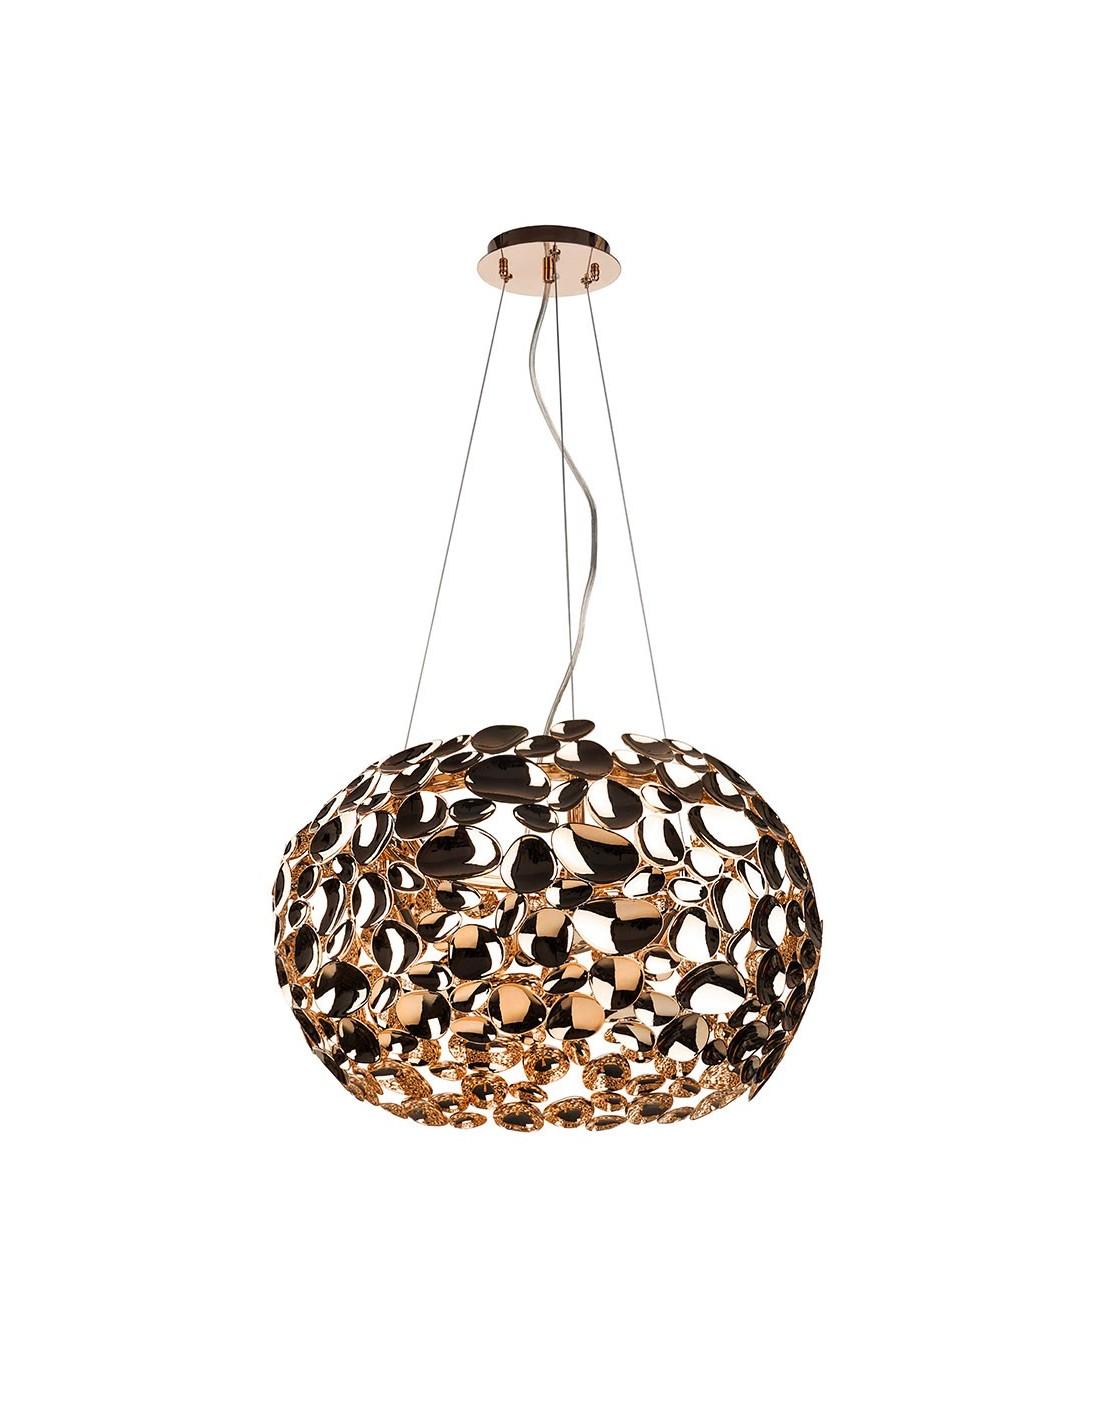 Lampa wisząca złota 6 punktowa Carera gold metalowa designerska Orlicki Design